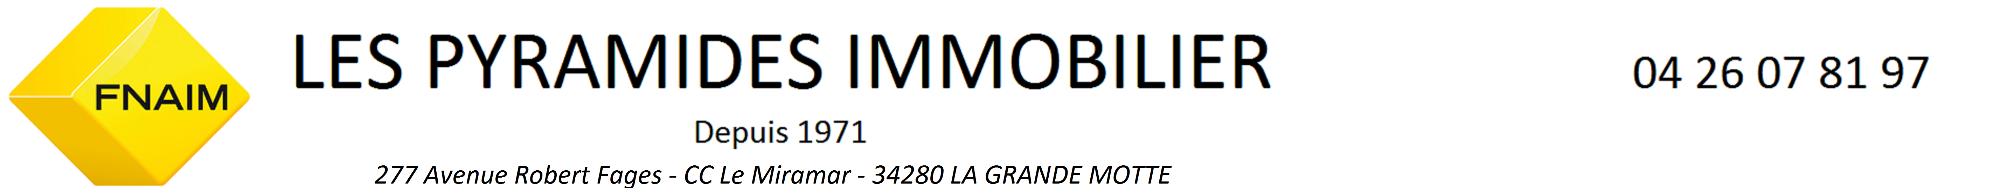 PYRAMIDES IMMOBILIER LA GRANDE MOTTE